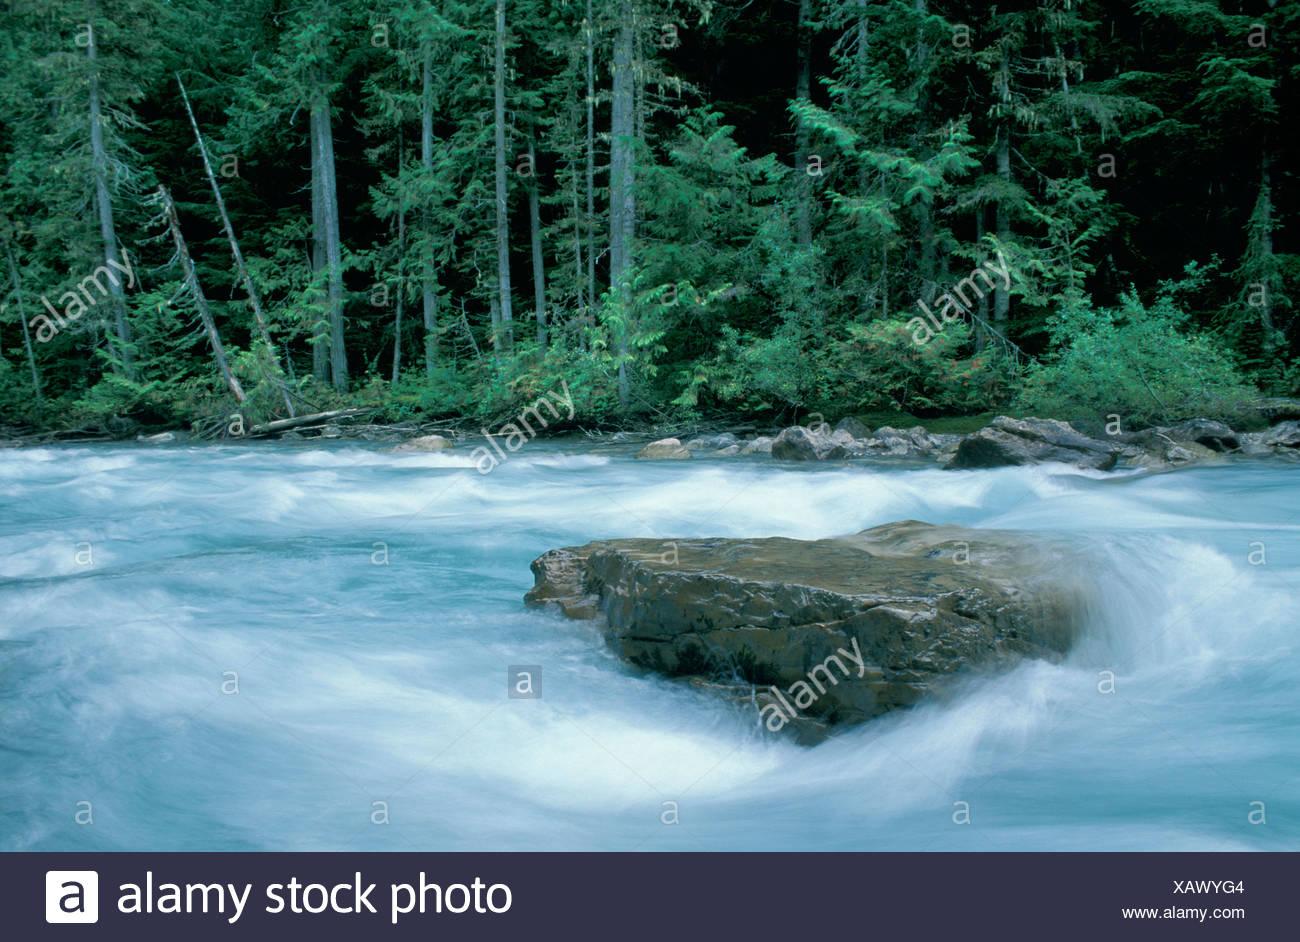 Britisch-Kolumbien Kanada Nord Amerika Amerika Robson River Berg Lake Trail Mount Robson Provincal Park Wasser b Stockbild